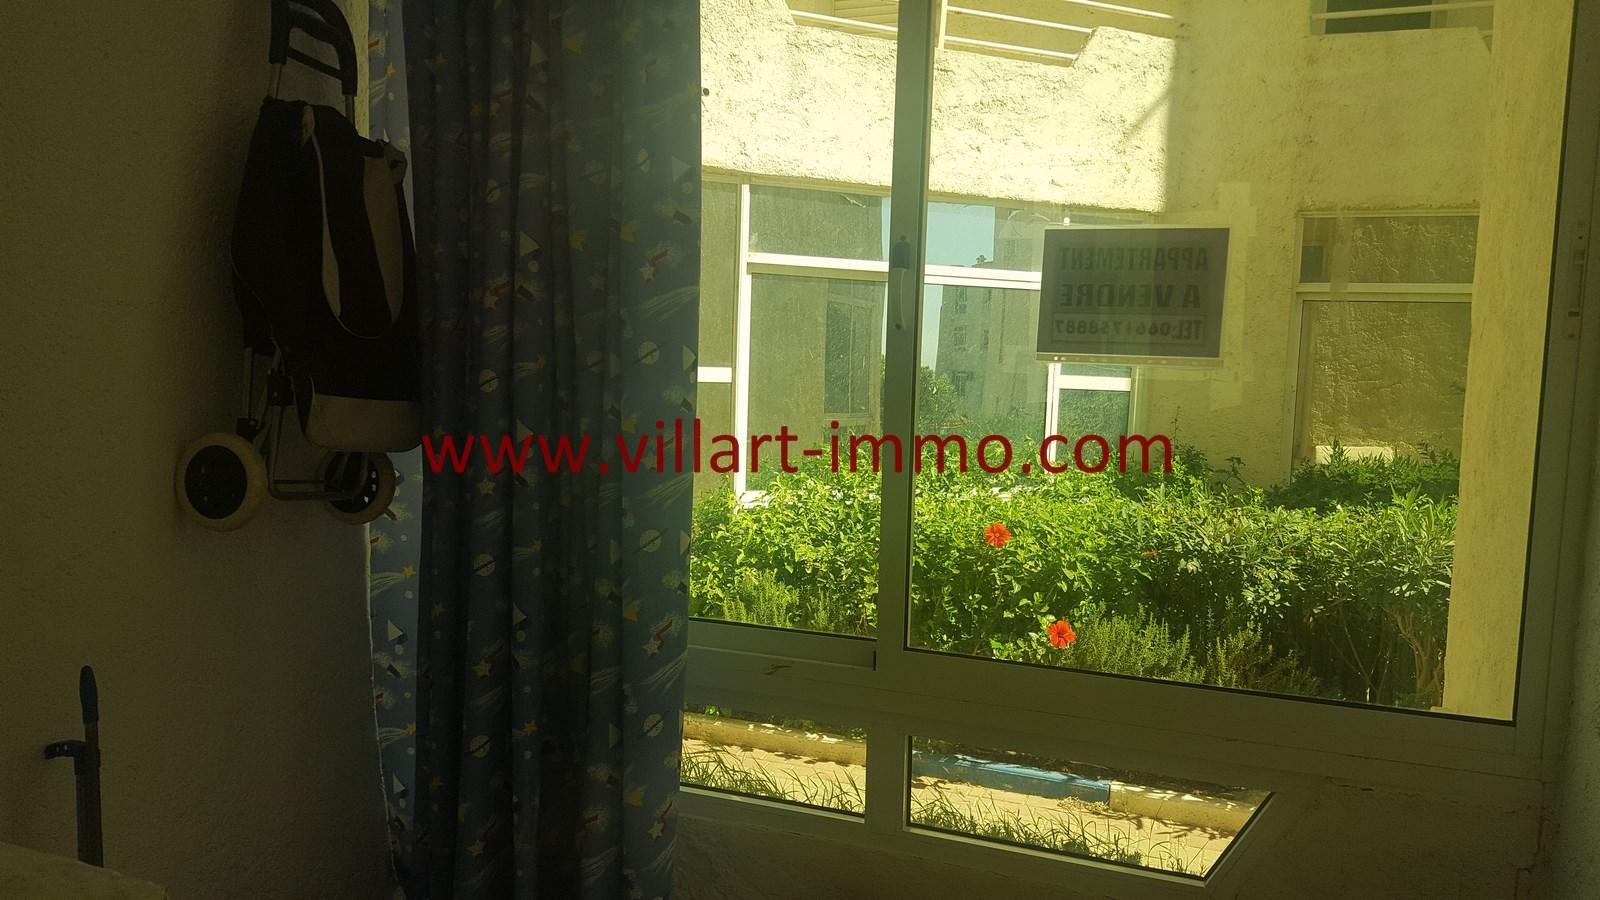 4-Vente-Appartement-Assilah-Buanderie-VA508-Villart Immo